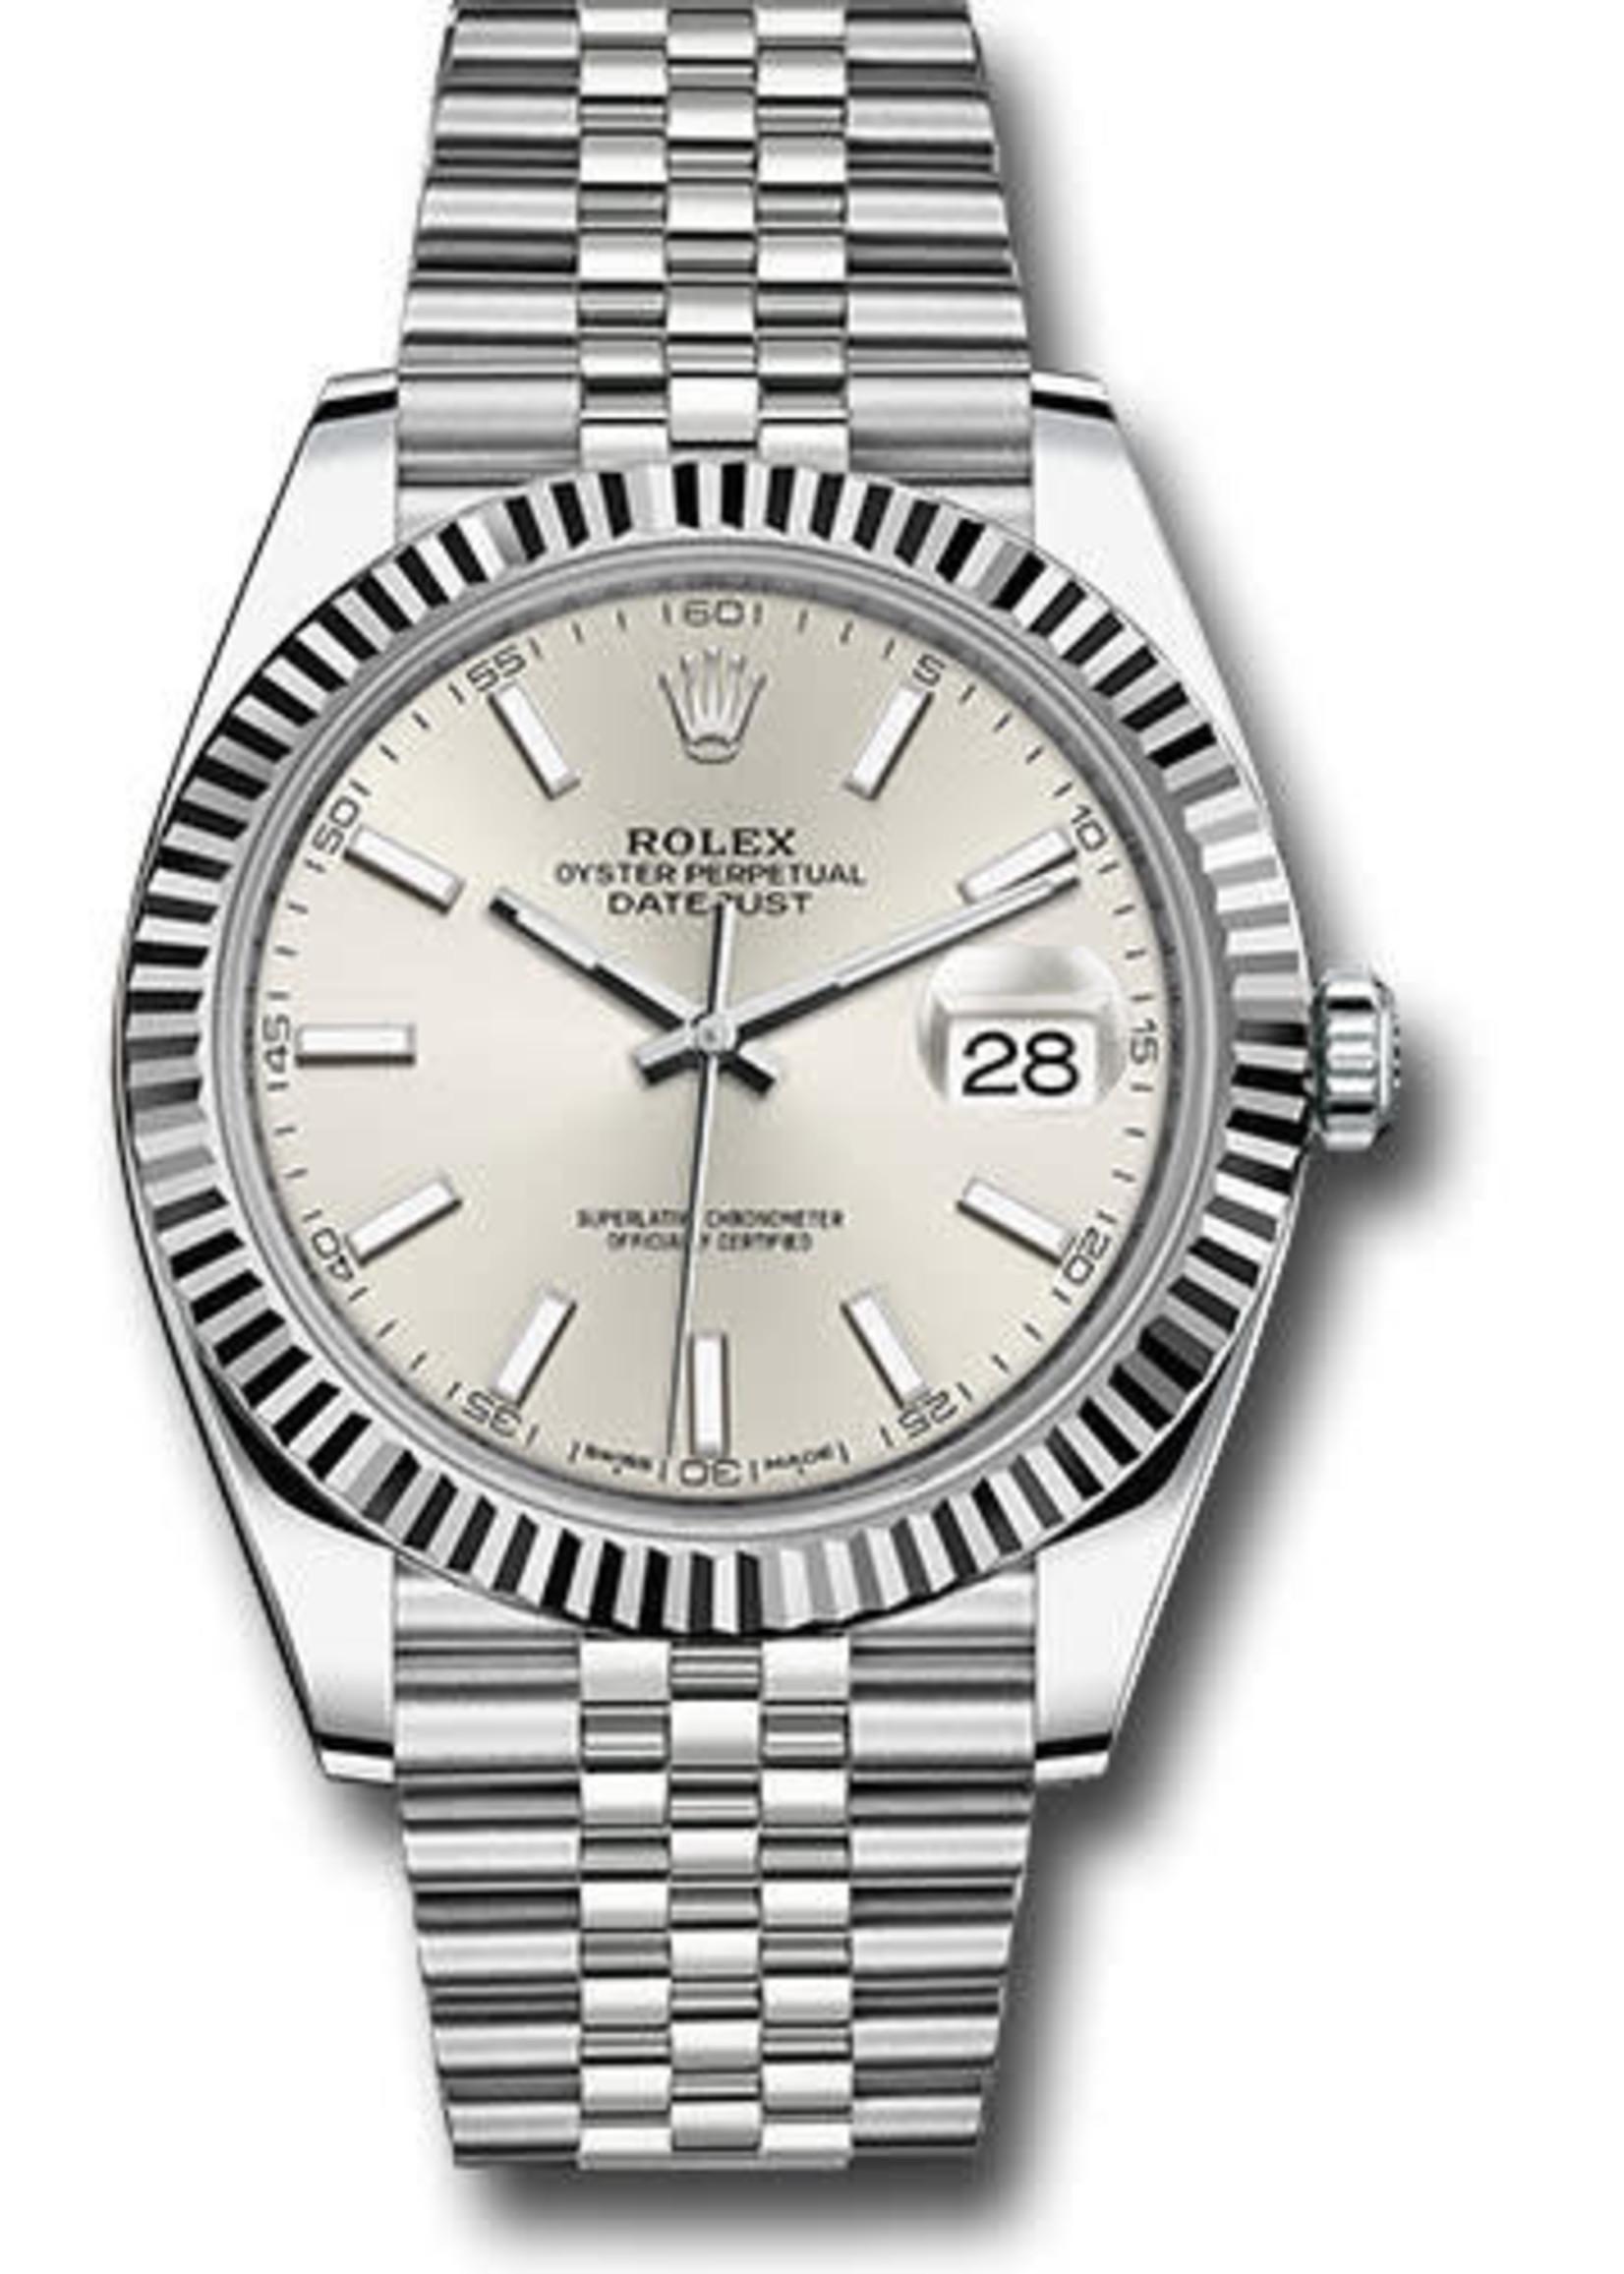 Rolex Rolex datejust 41mm 2020 BP